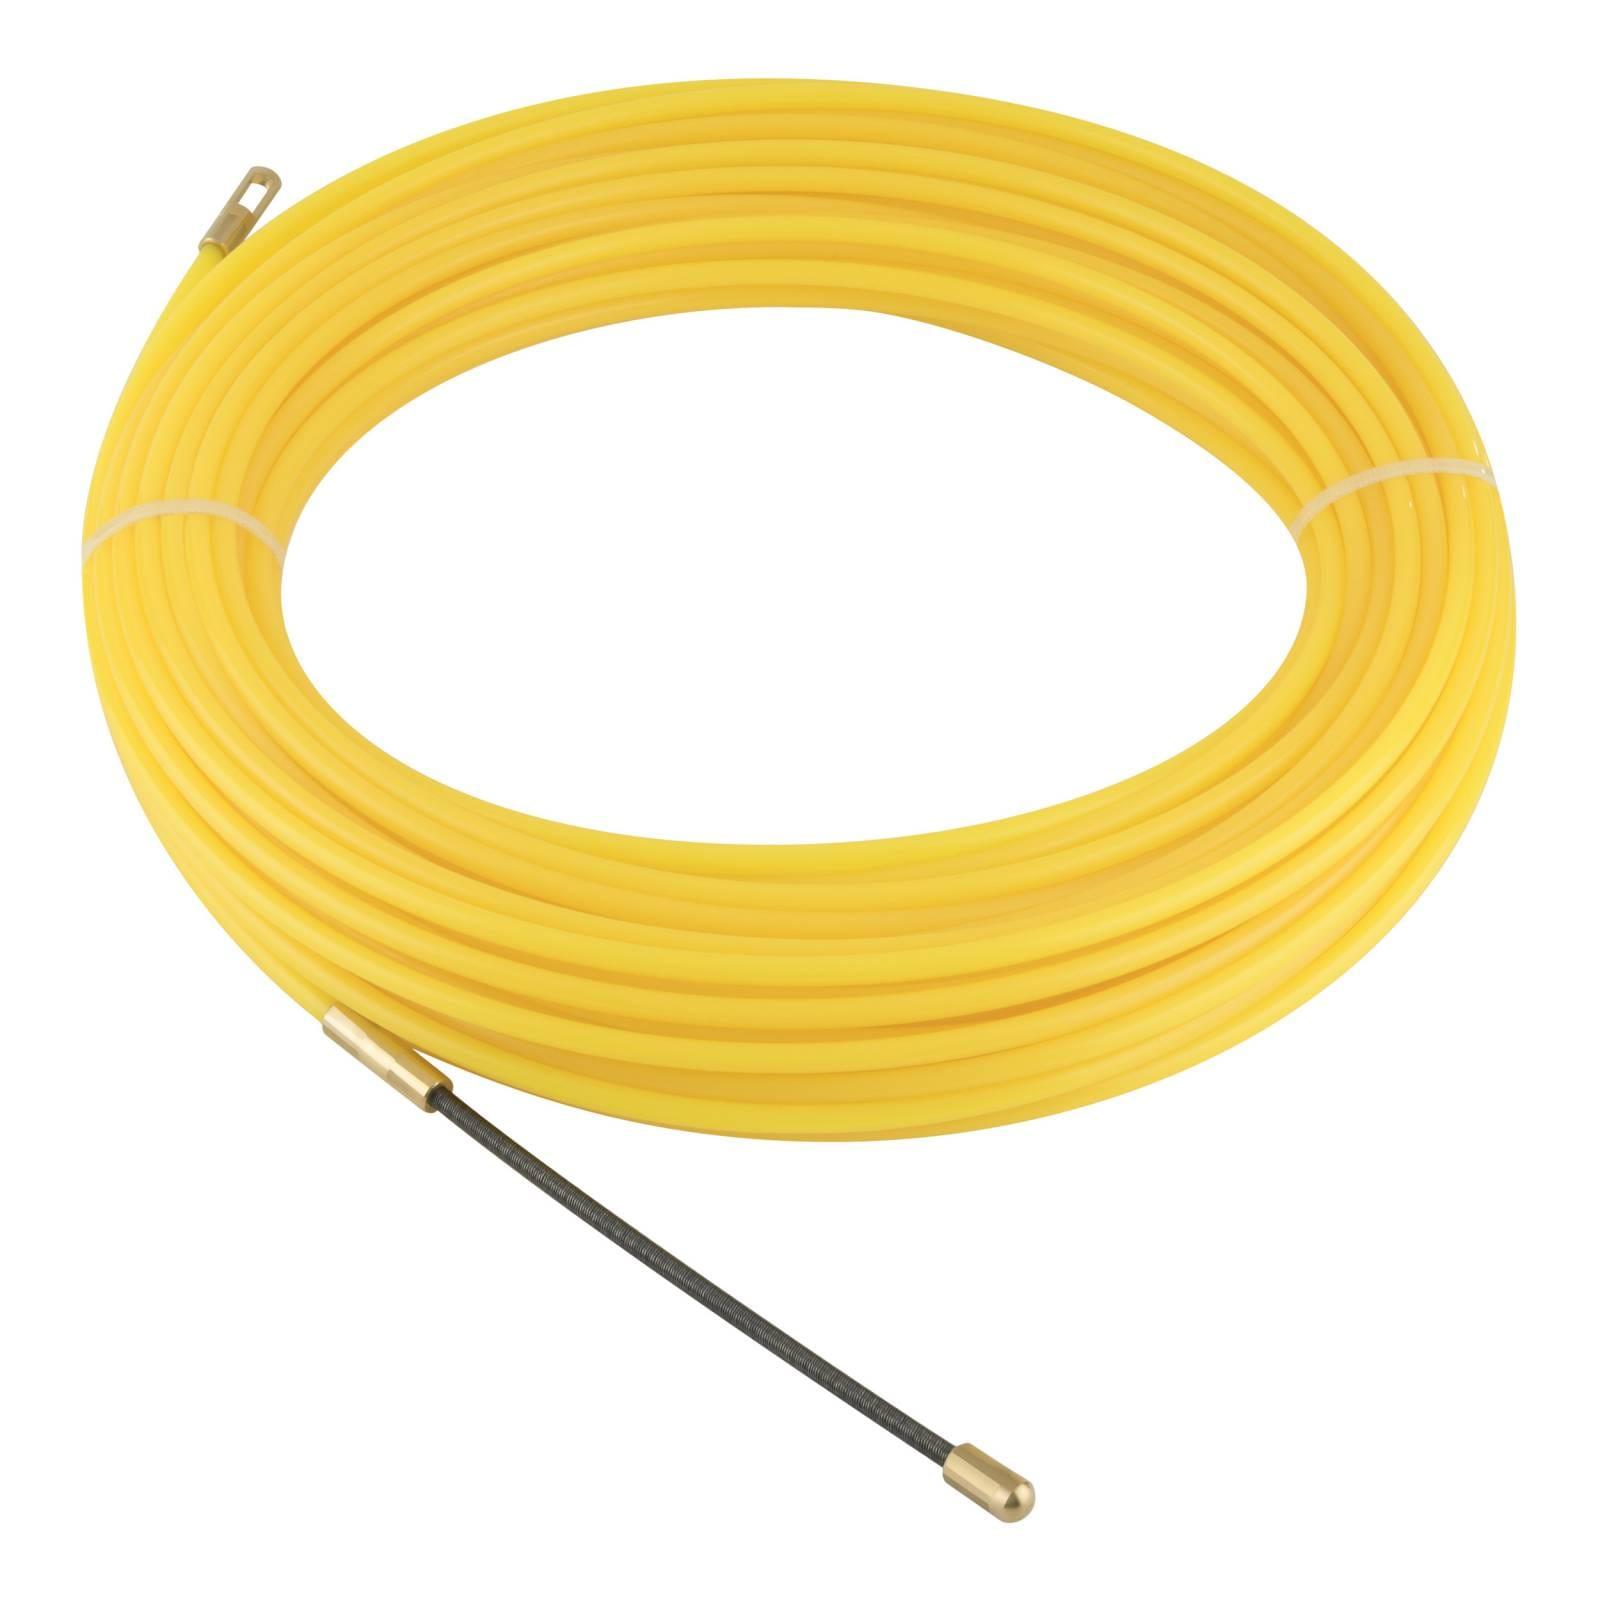 Guía de nylon para instalación de cable, de 20 metros